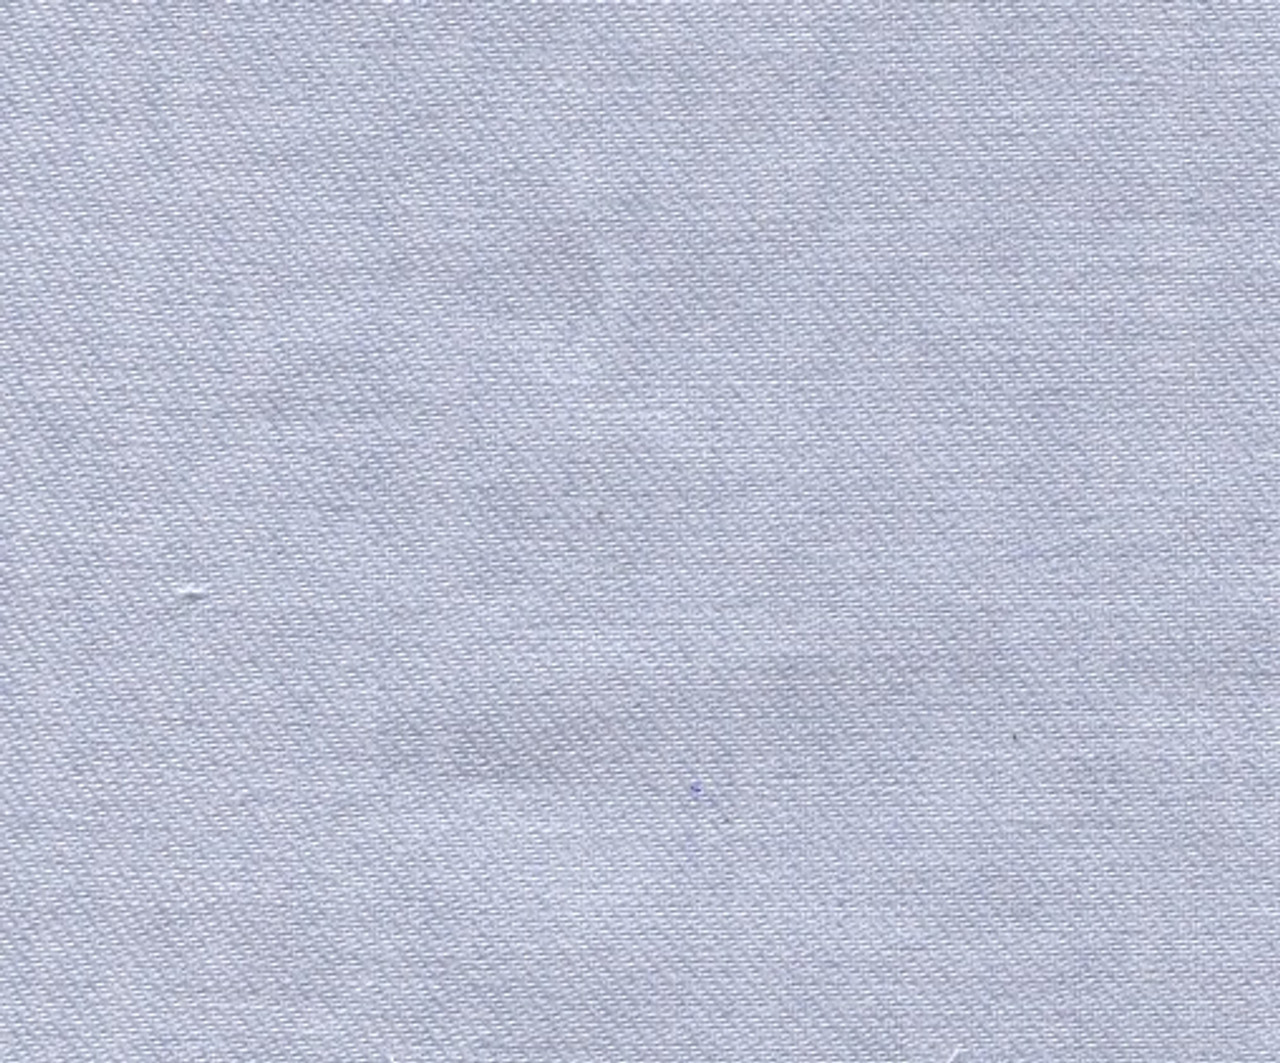 Pale Blue Truella - 20% Wool 80% Cotton Truella cosy winter fabric similar to Vyella or baby flannel 147 cm